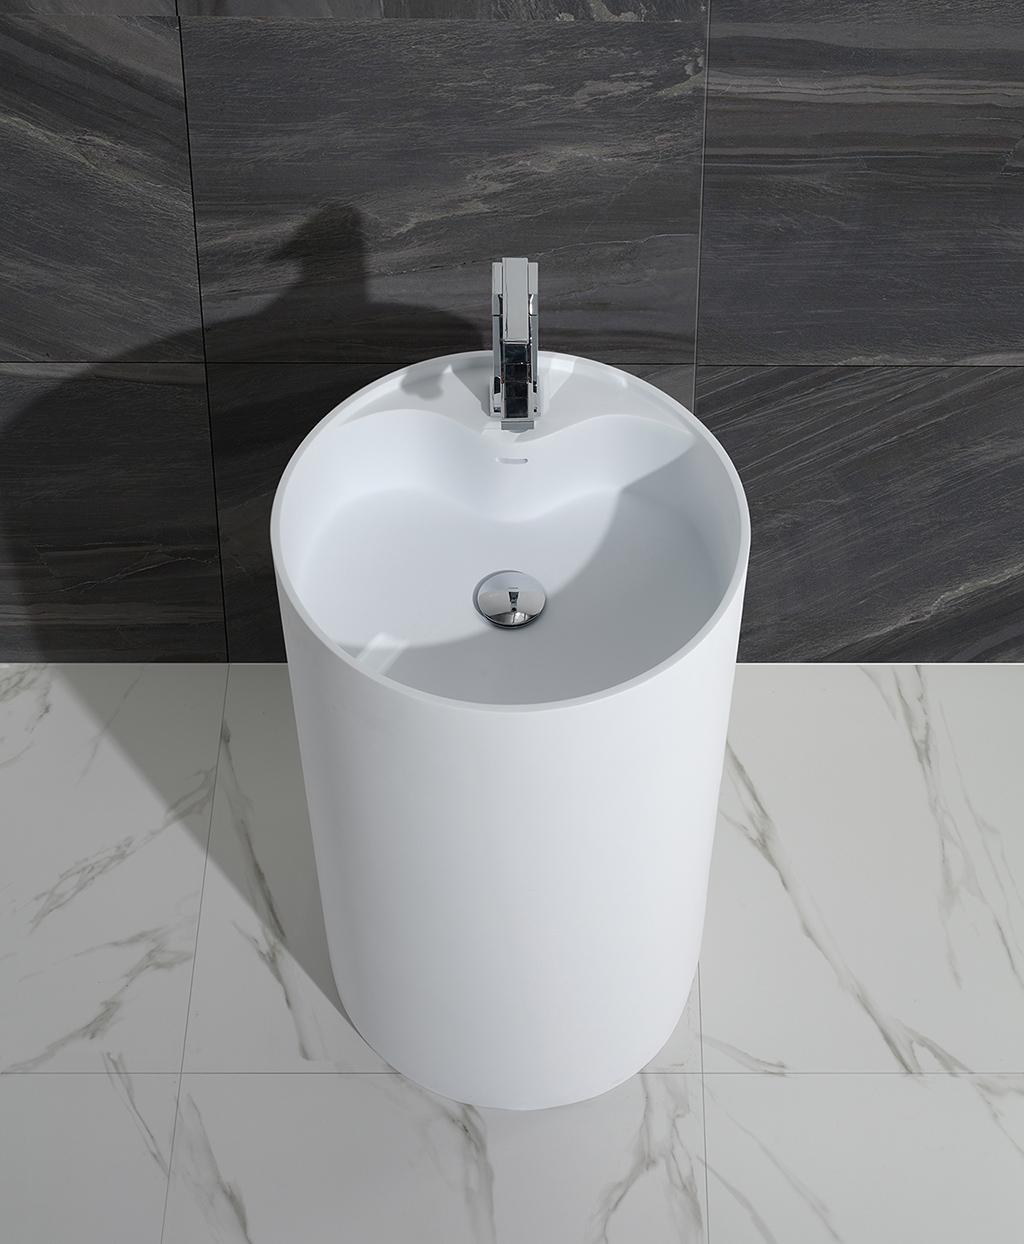 ware unique faux KingKonree Brand freestanding basin